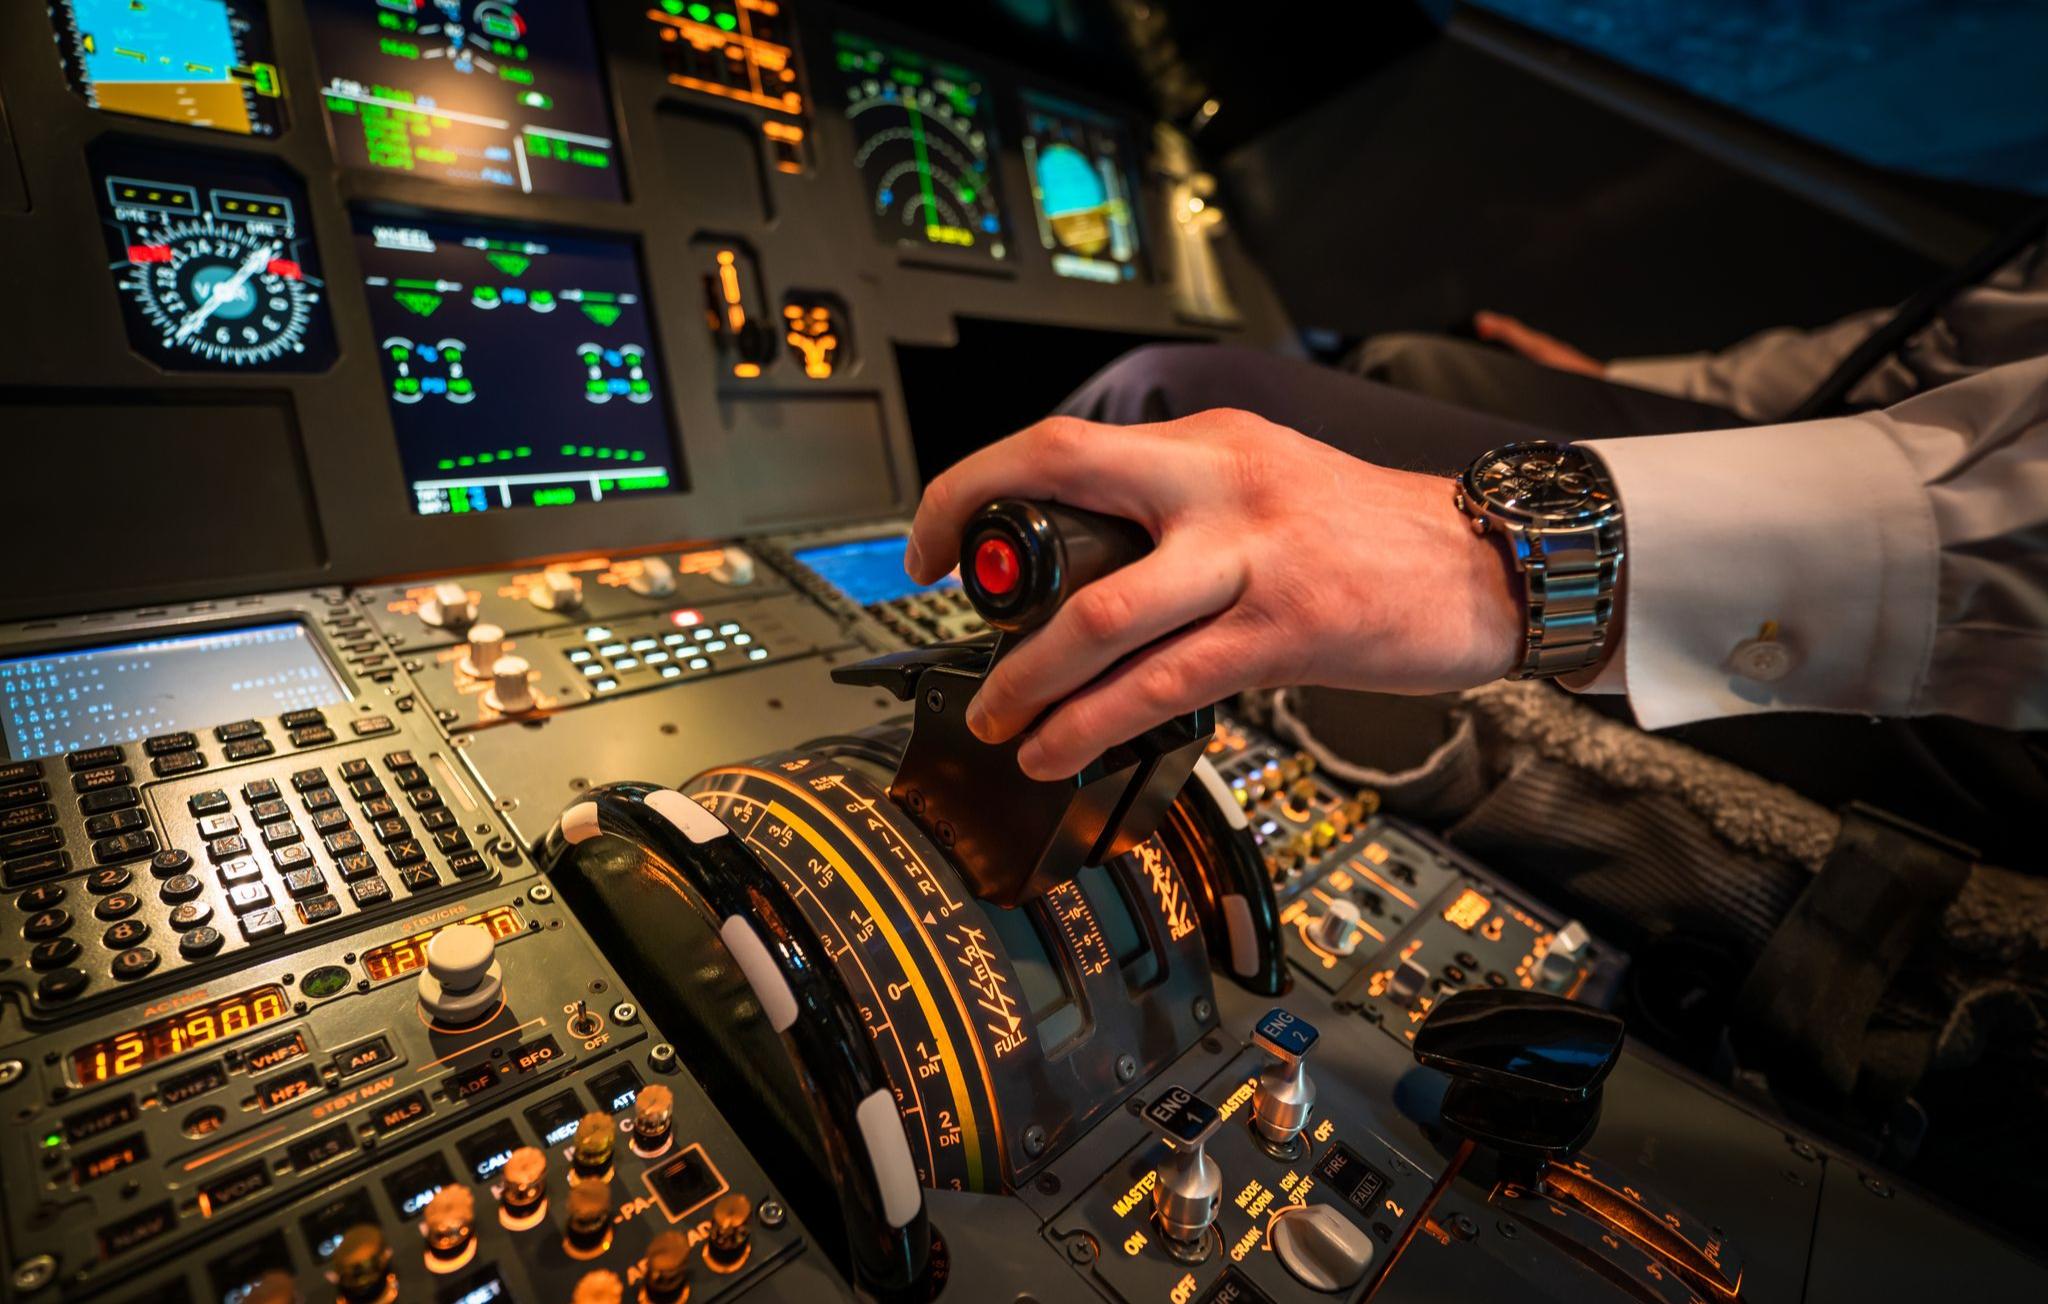 flugsimulator-frankfurt-am-main-cockpit1616414758